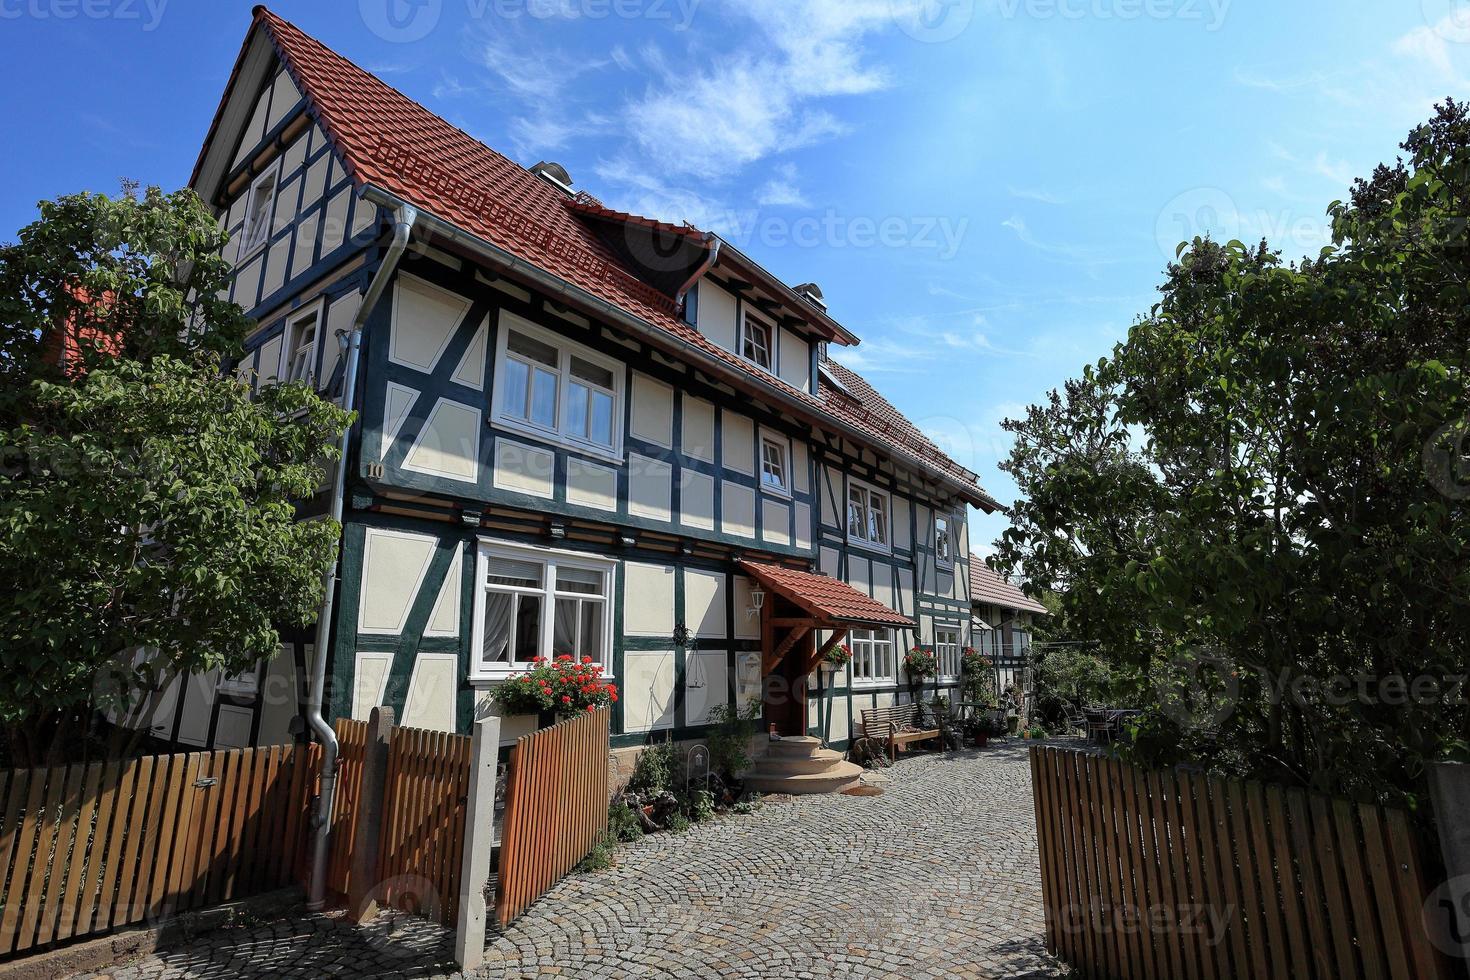 fachwerkerhäuser en hessen en deutschland foto